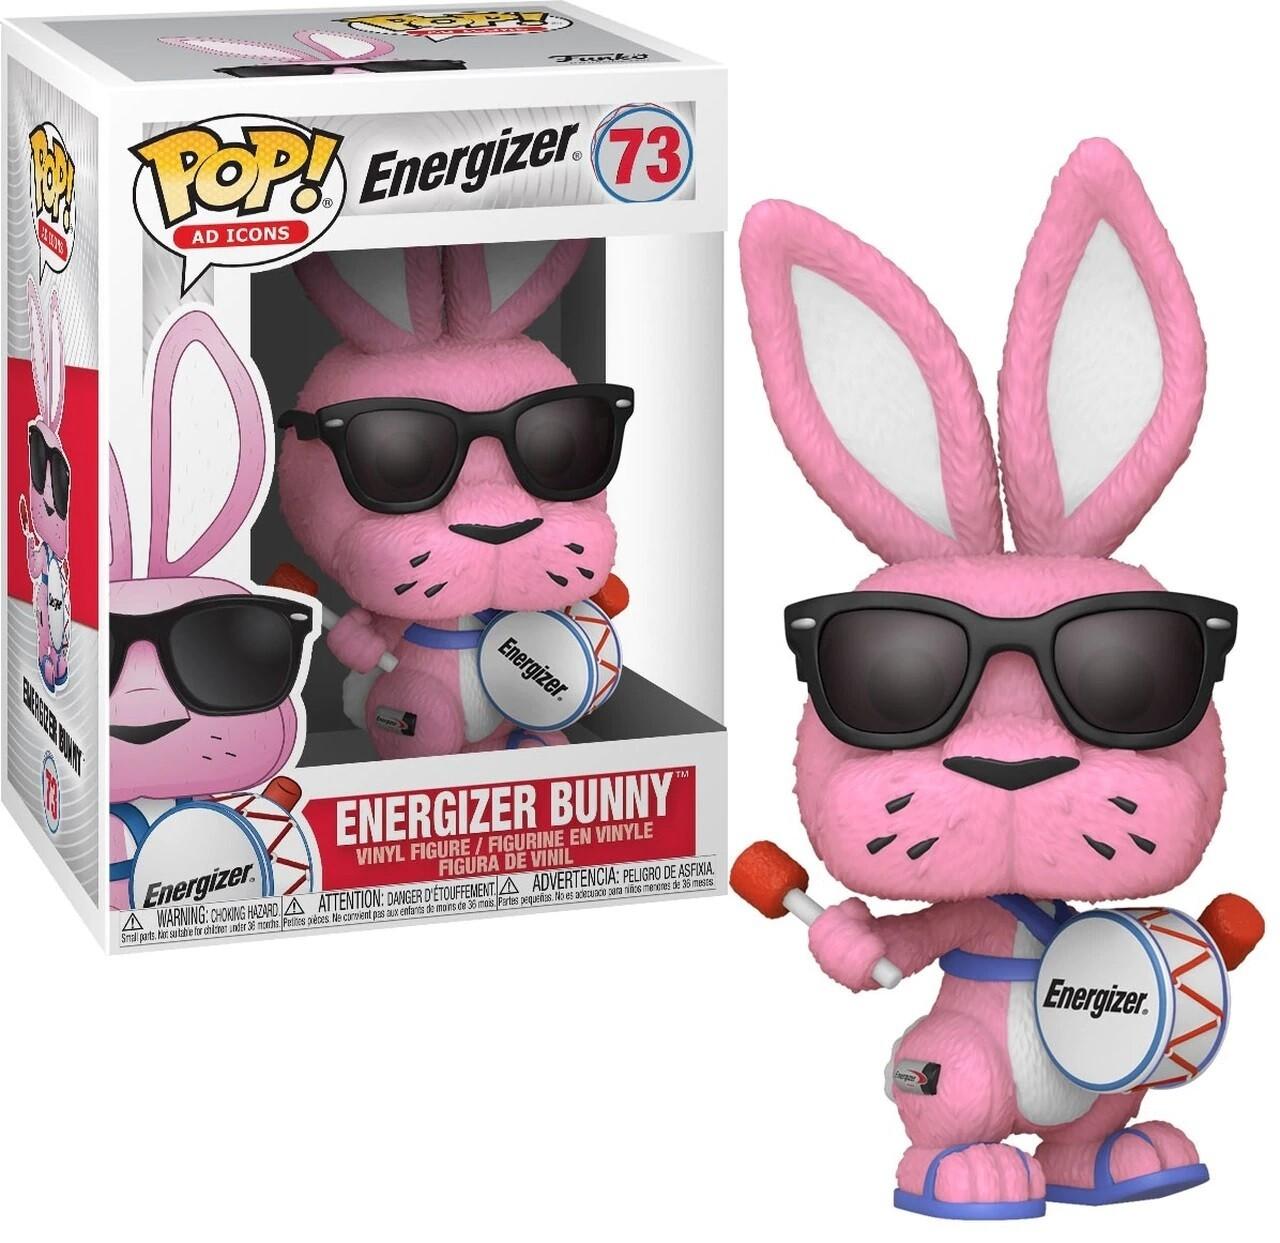 Funko AD Icons - Energizer Bunny Pop! Vinyl Figure